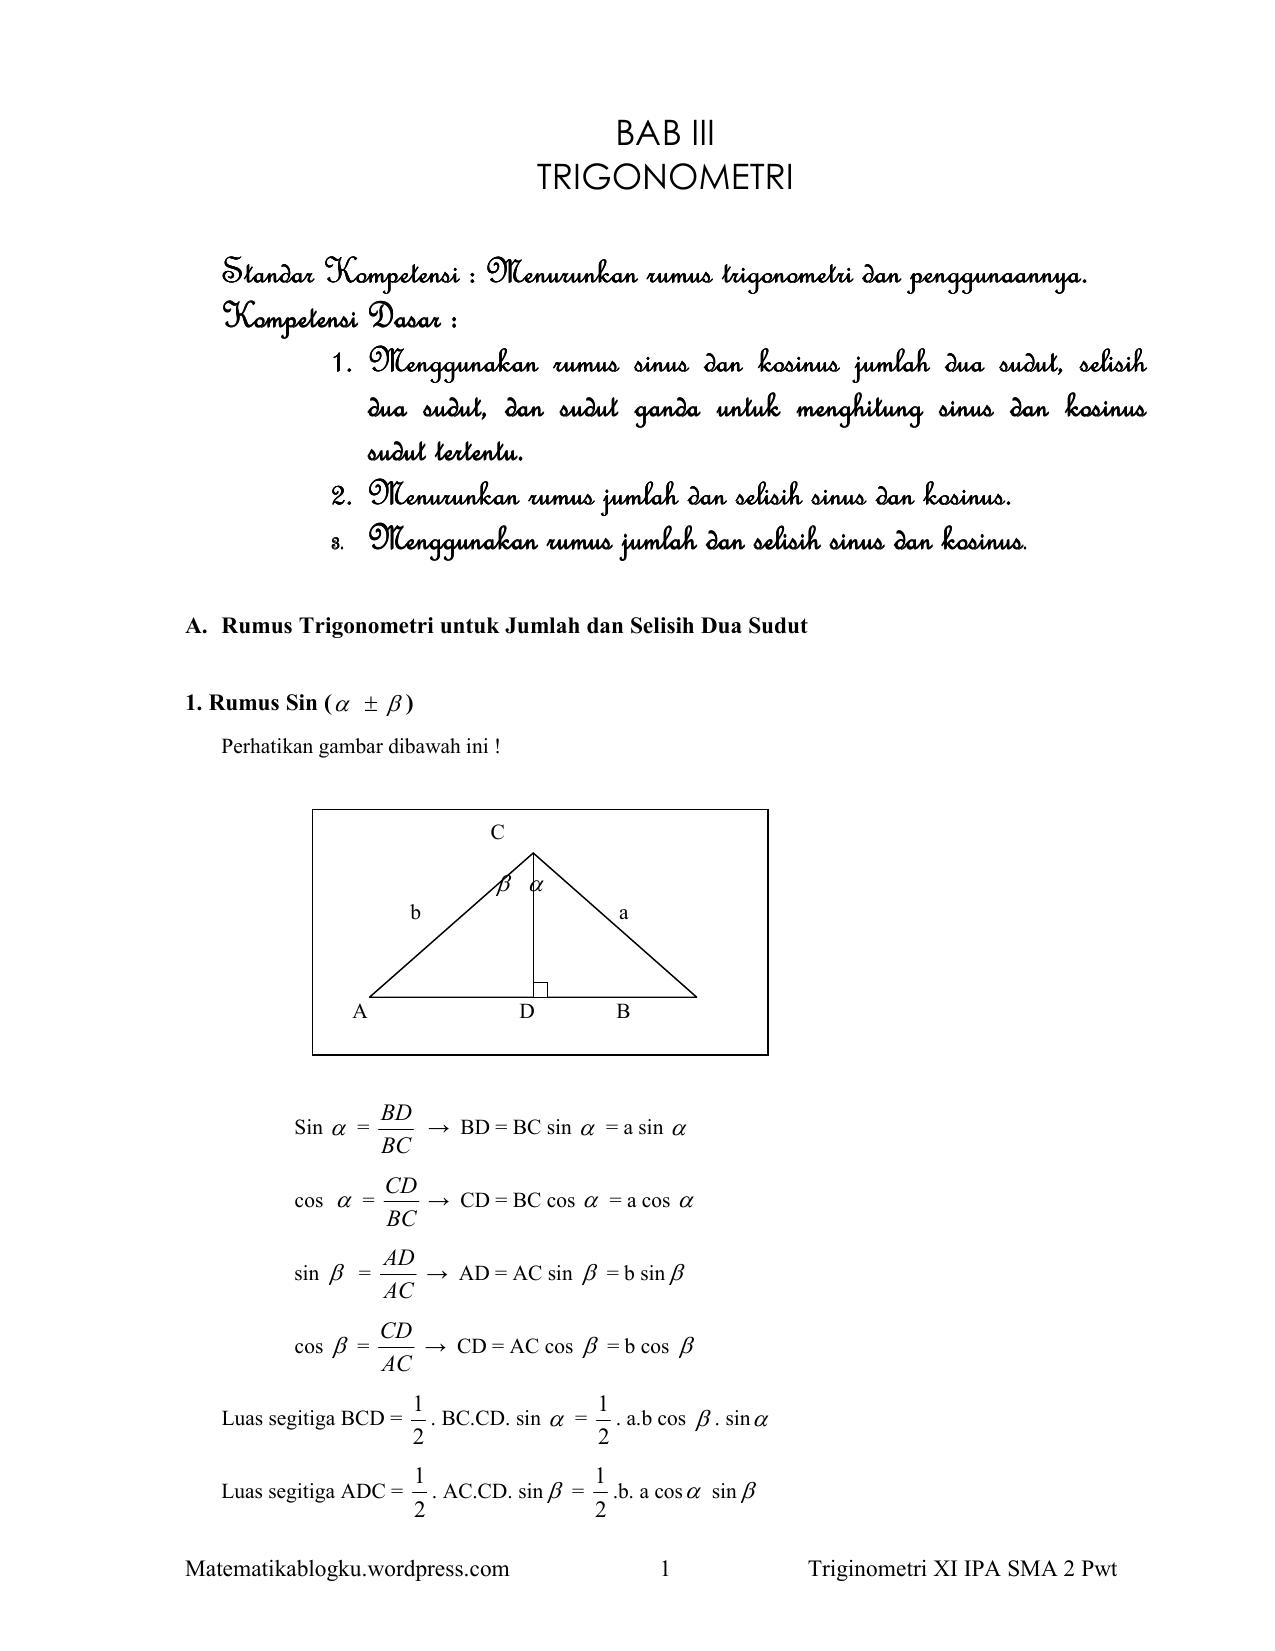 Trigonometri Xi Ipa Matematikablogku